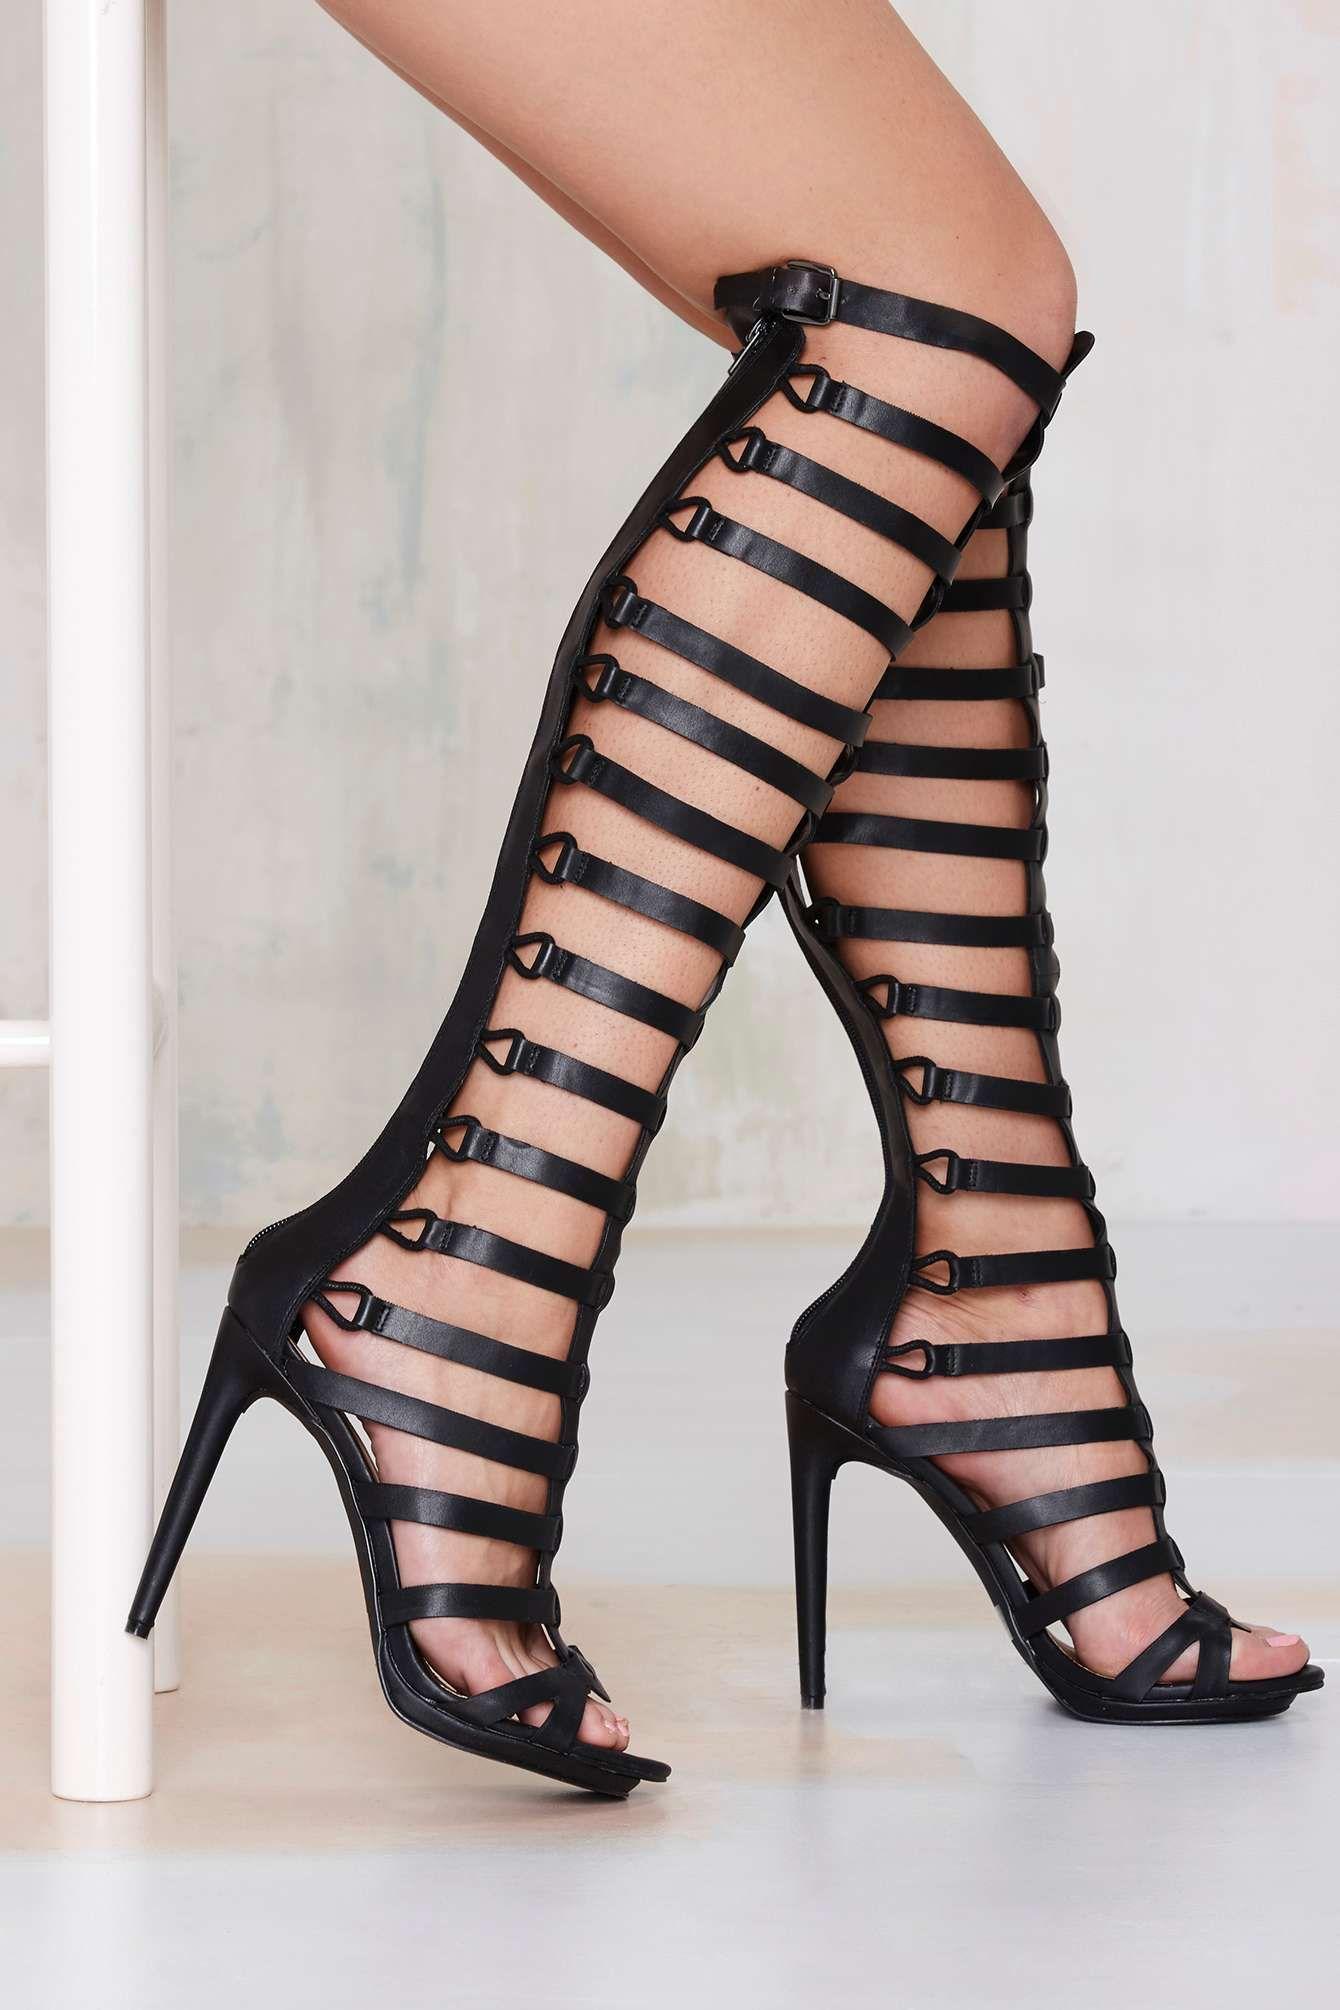 Pin on Beautiful shoes.